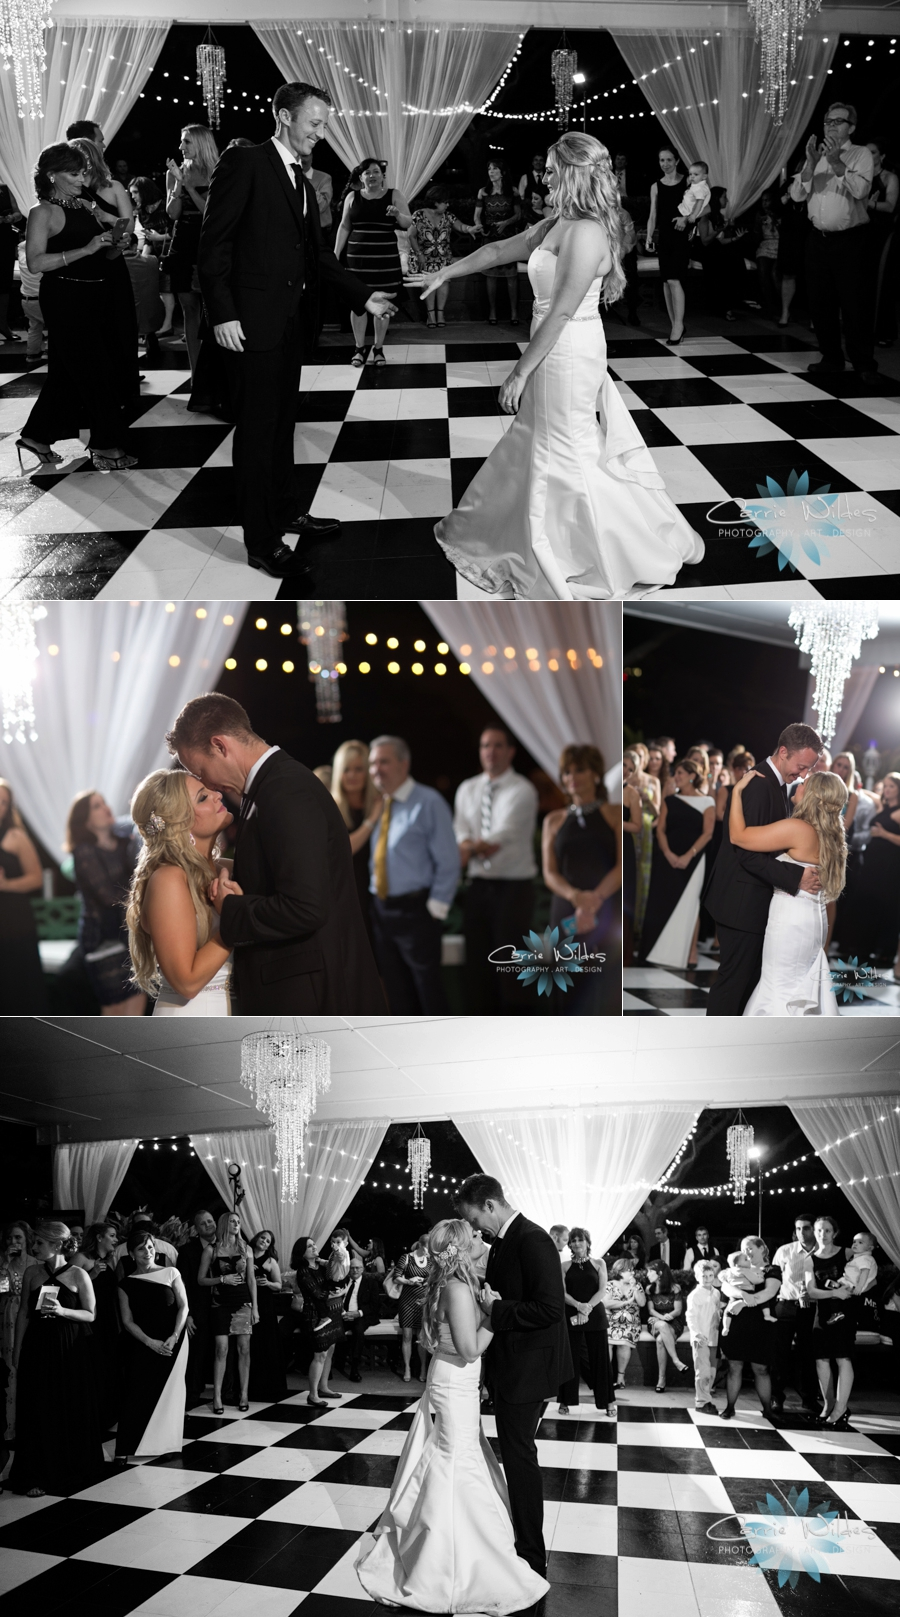 11_21_15 Davis Island Garden Club Wedding_0036.jpg